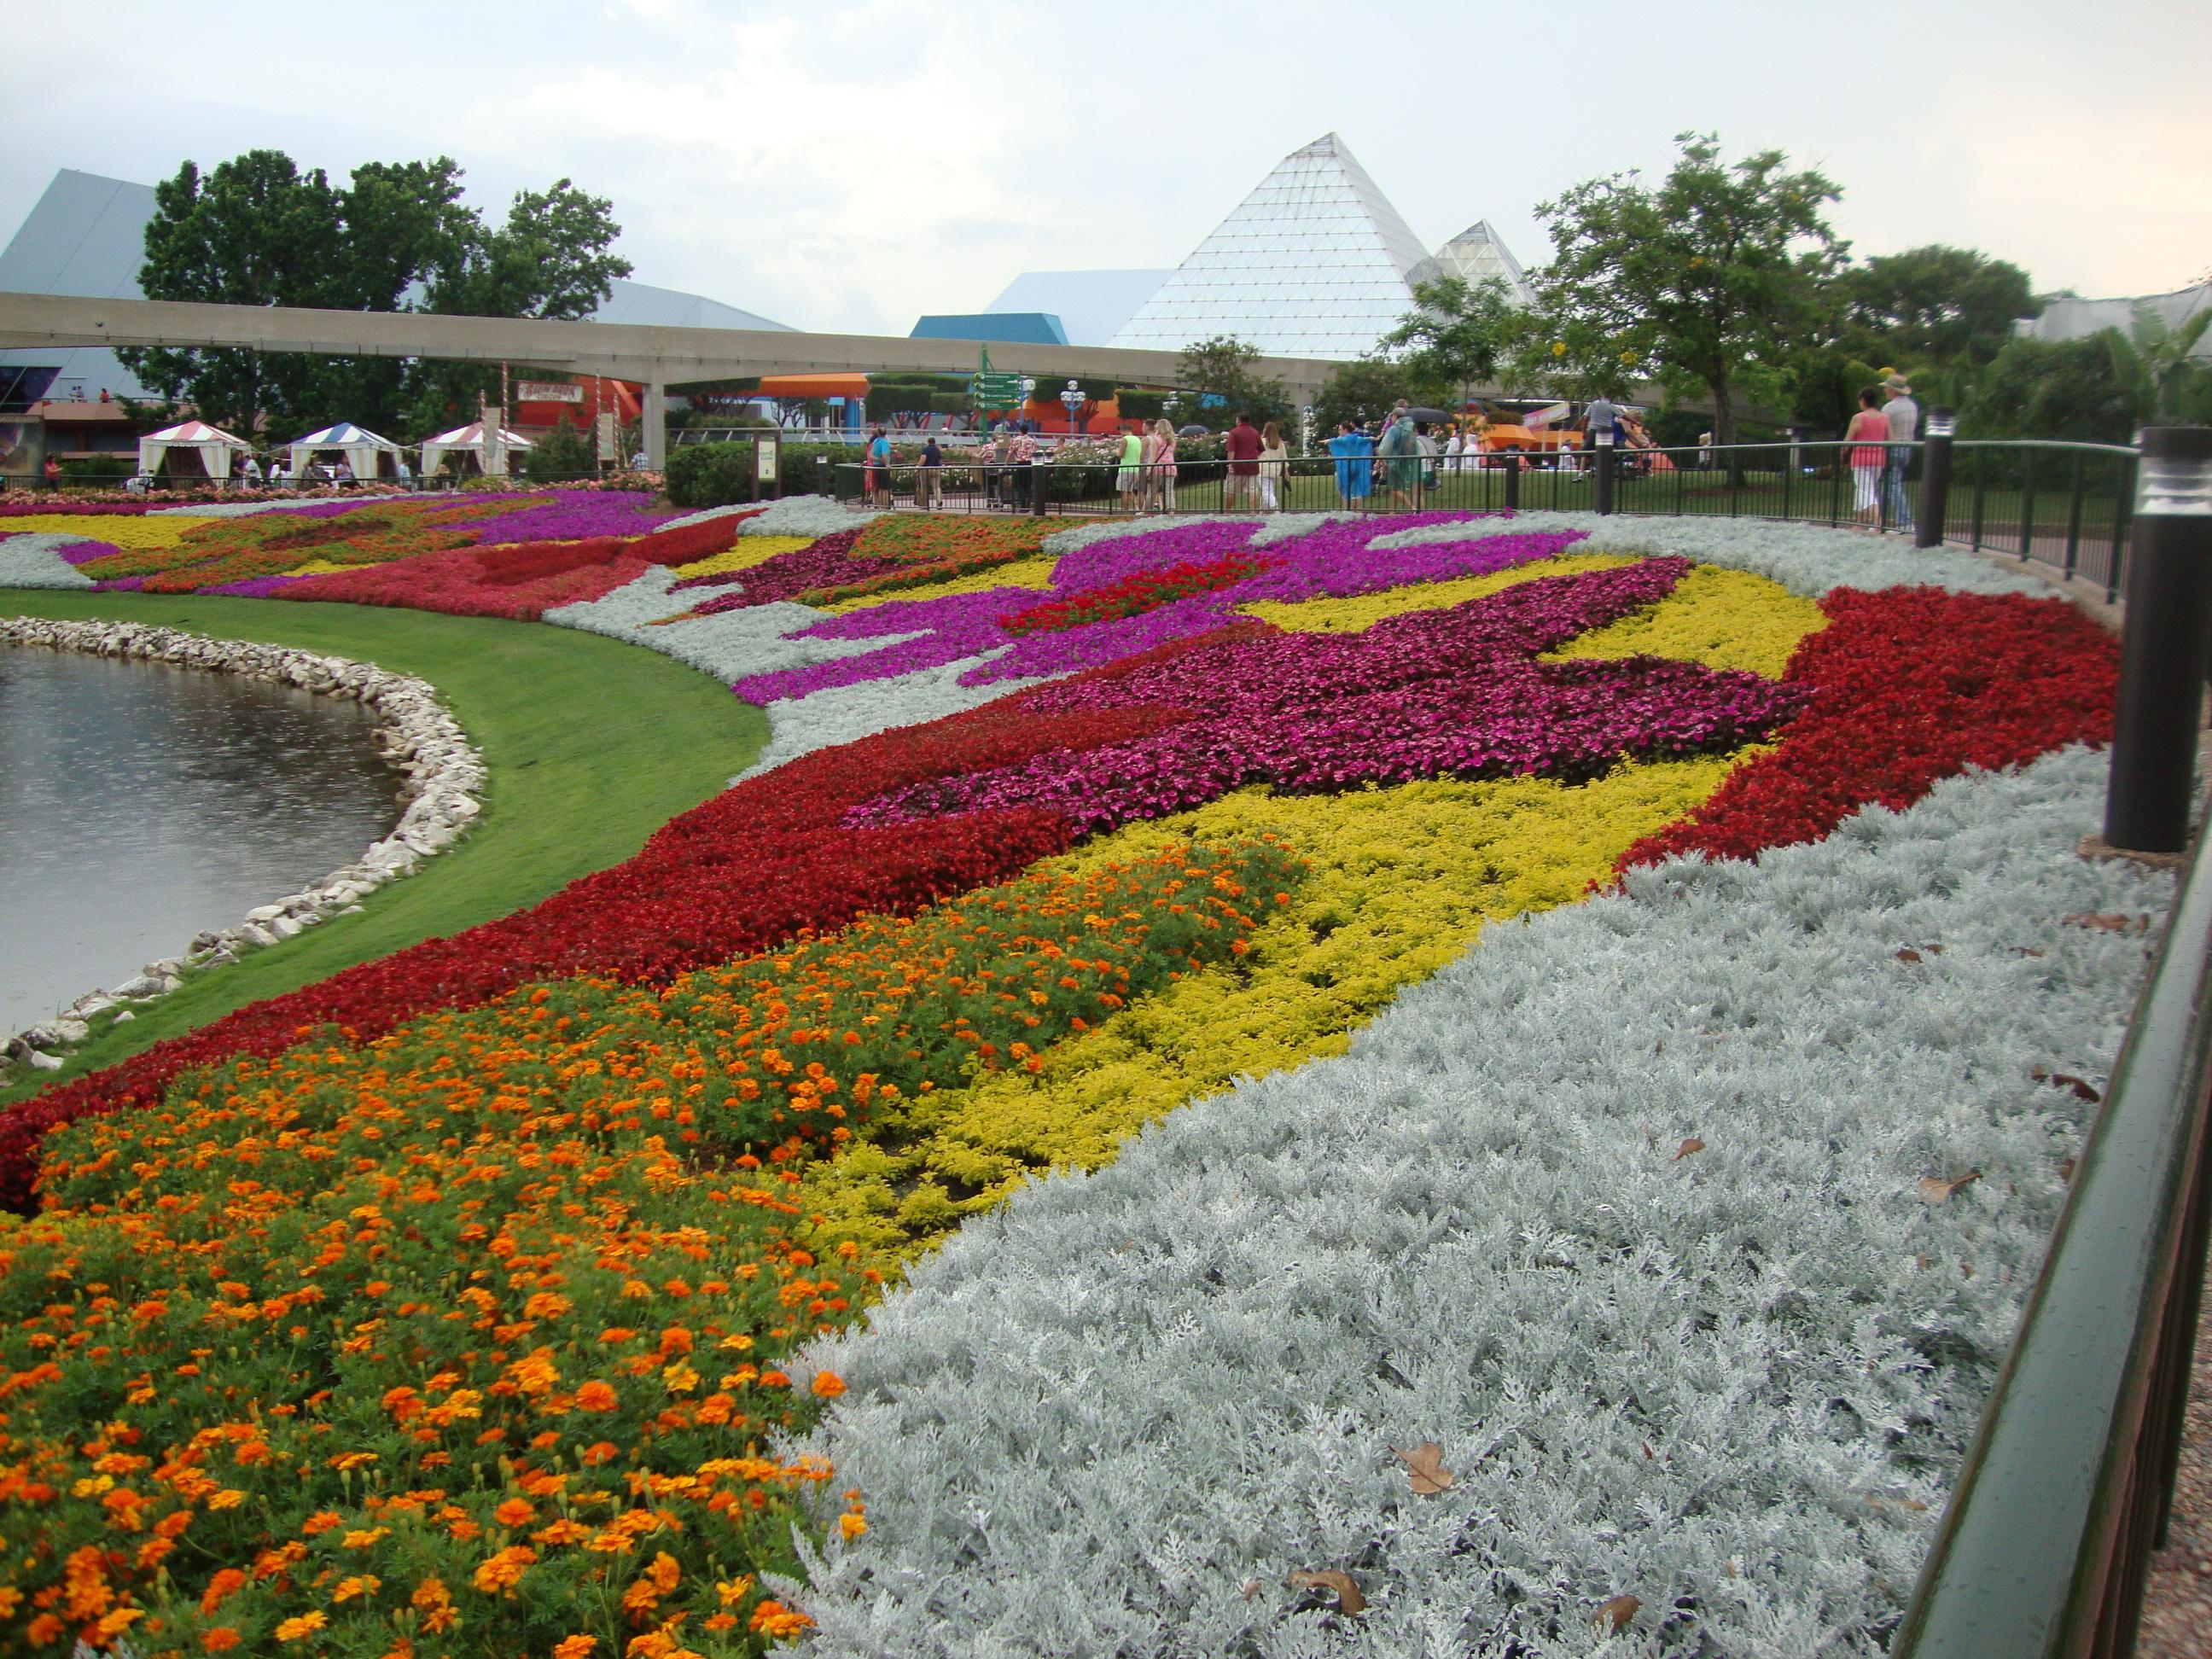 Walt Disney World for Grown-Ups: Epcot Flower & Garden Festival